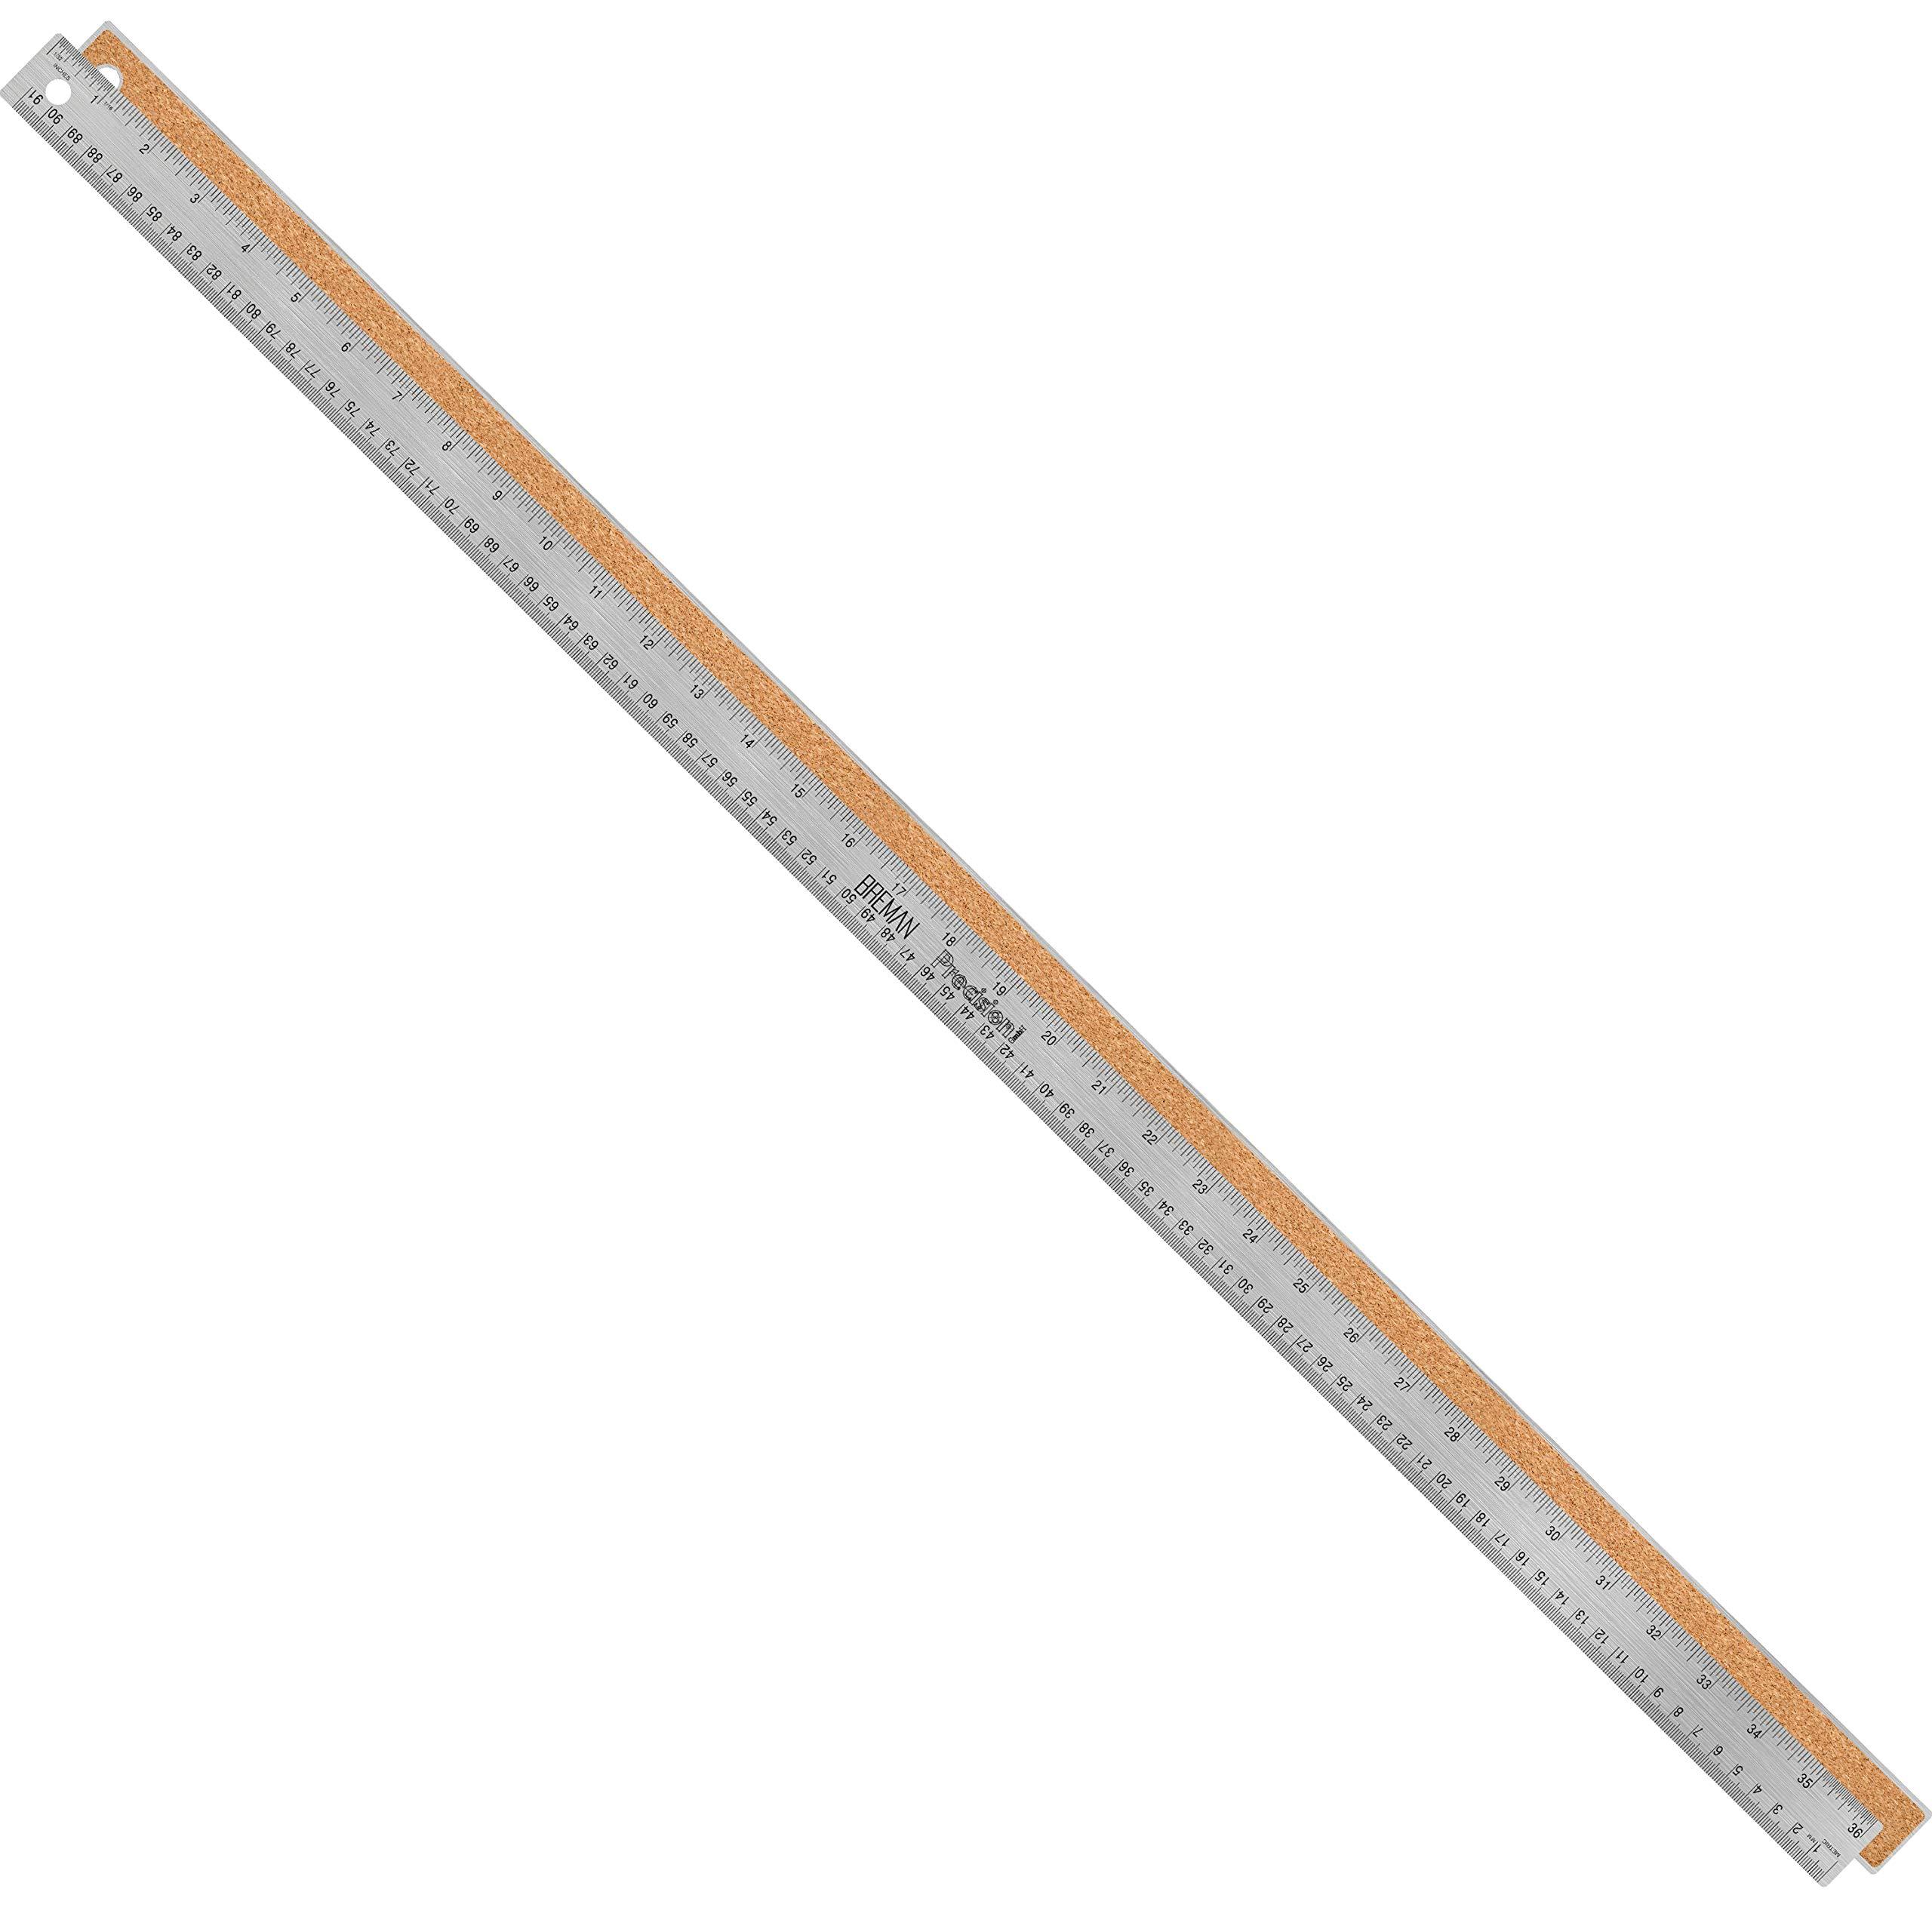 Breman Precision Stainless Steel Metal Rulers